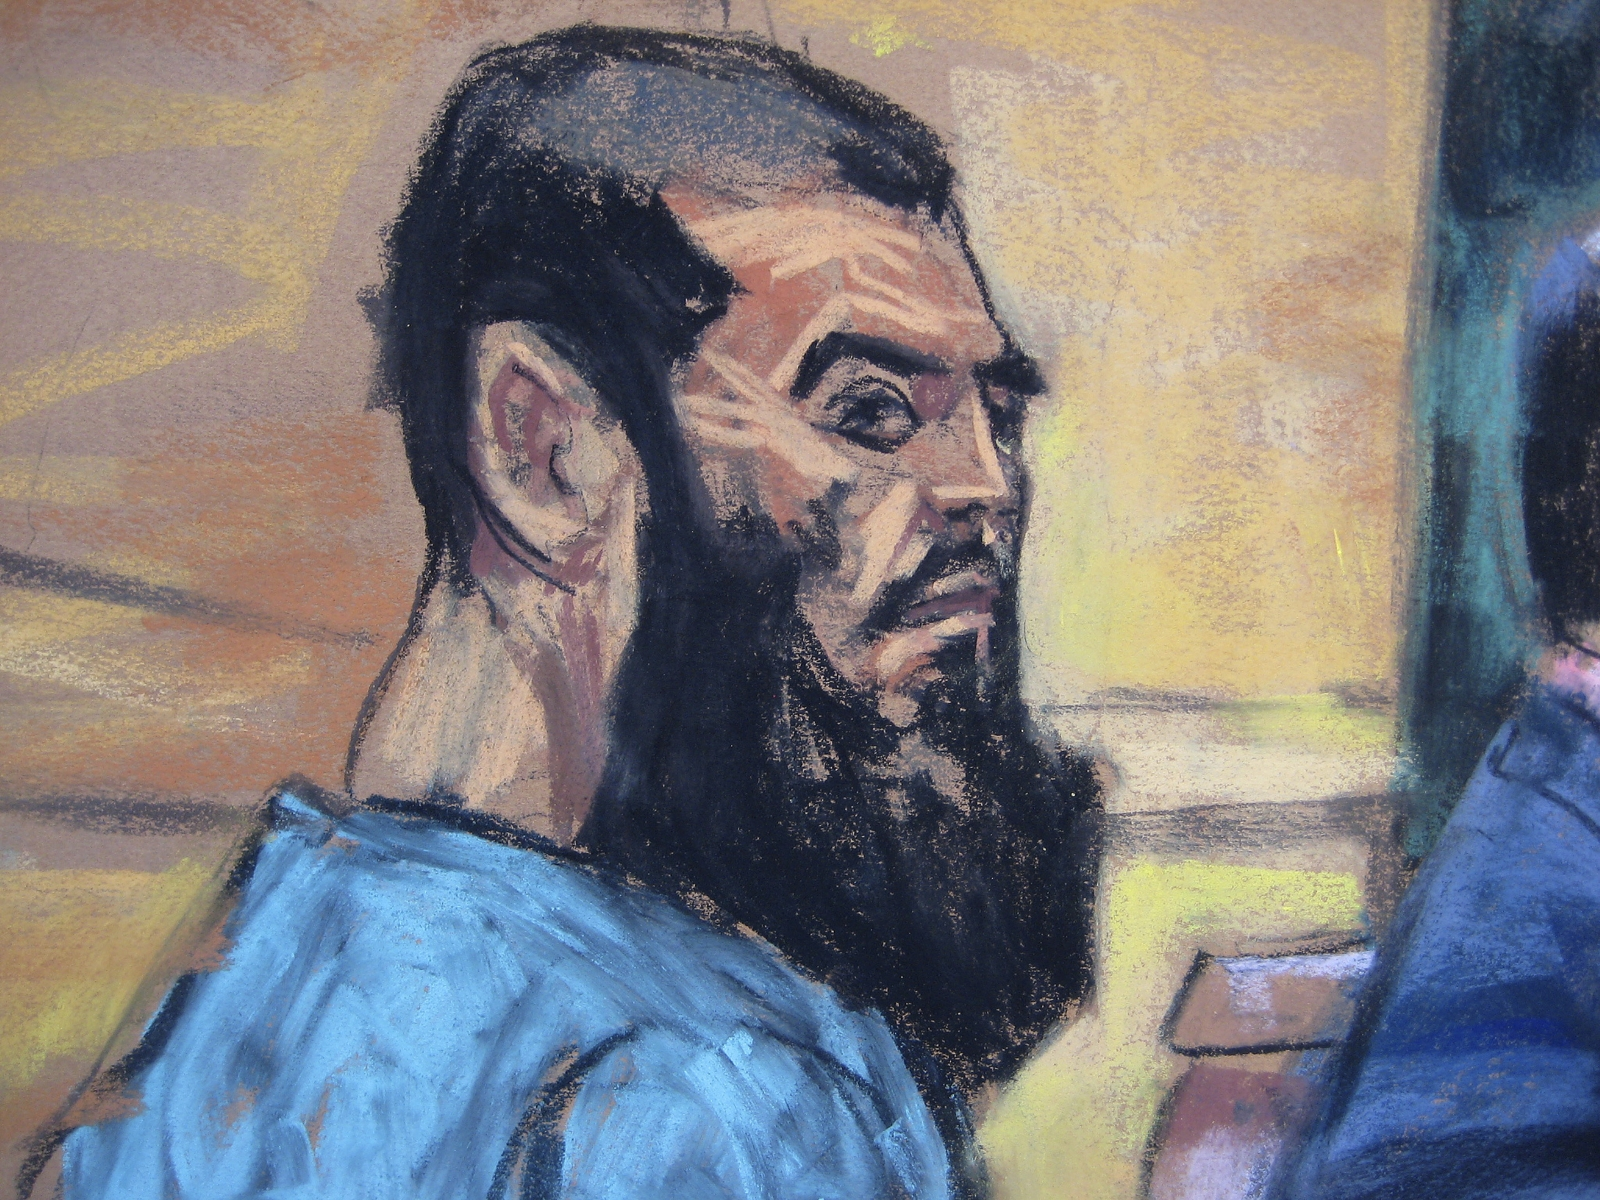 Abid Naseer accused of plotting Manchester terror attack as big as 9/11